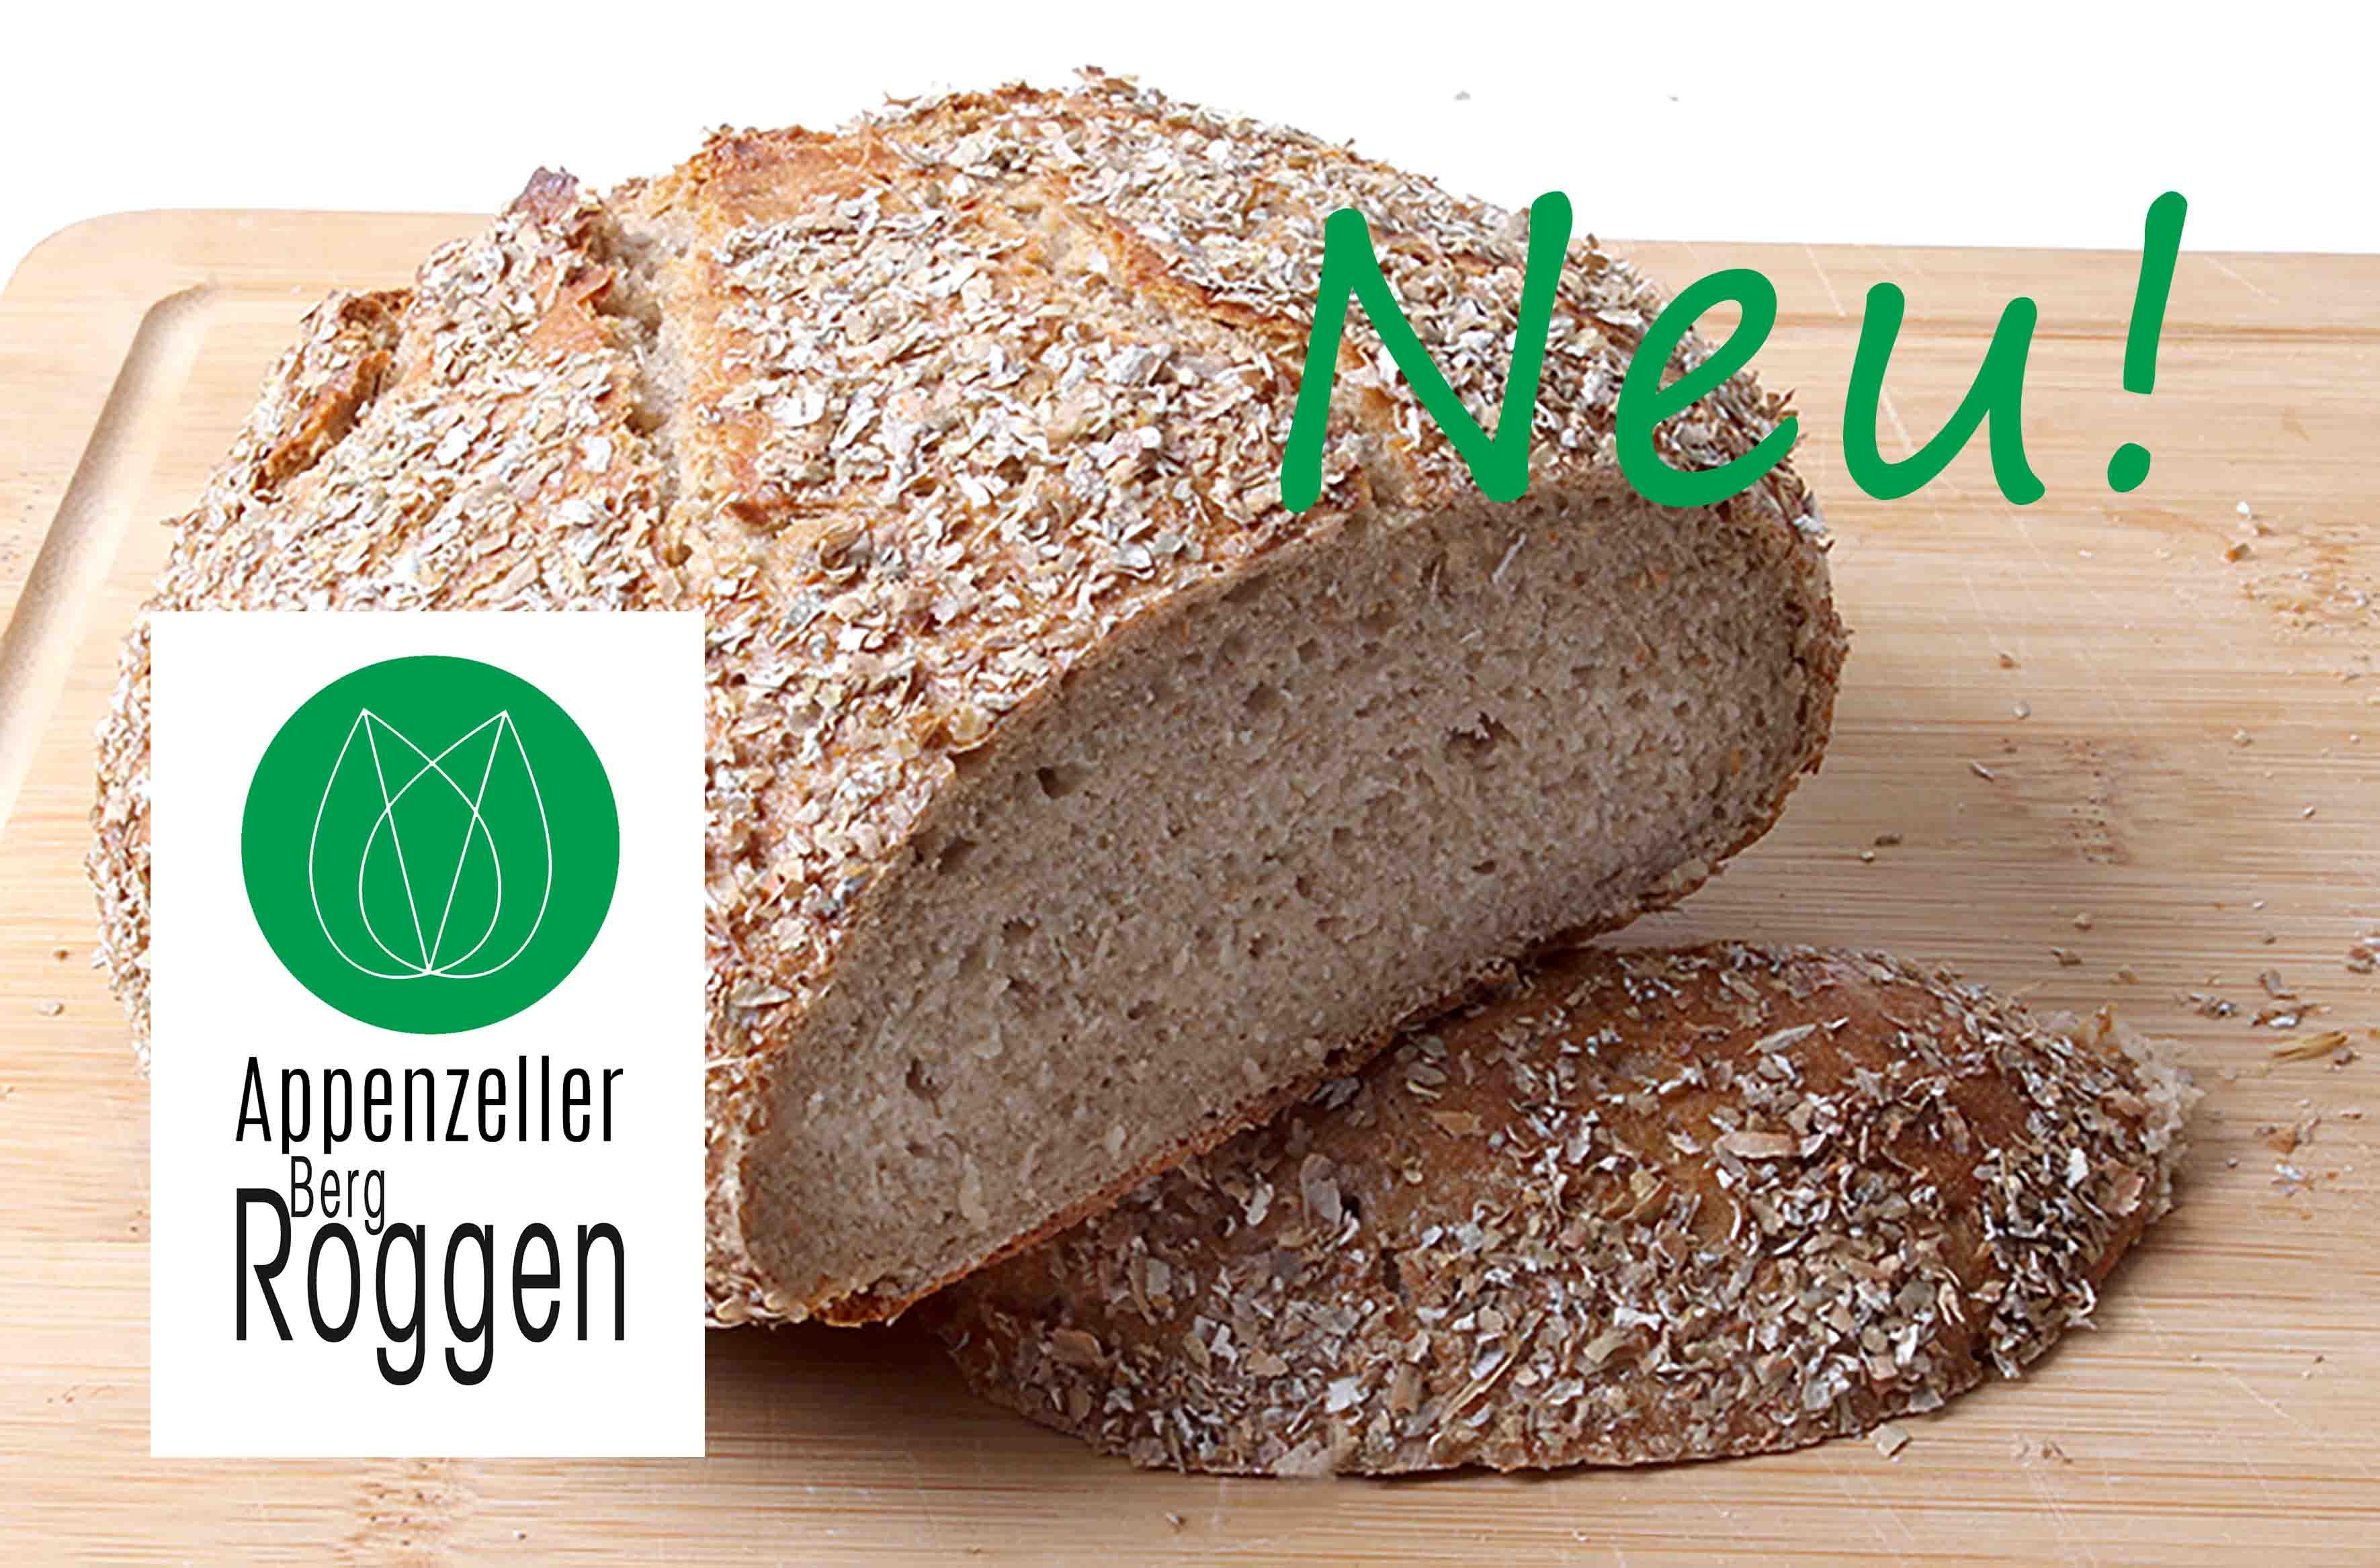 Appenzeller-BergRoggenbrot-2020-wedeko